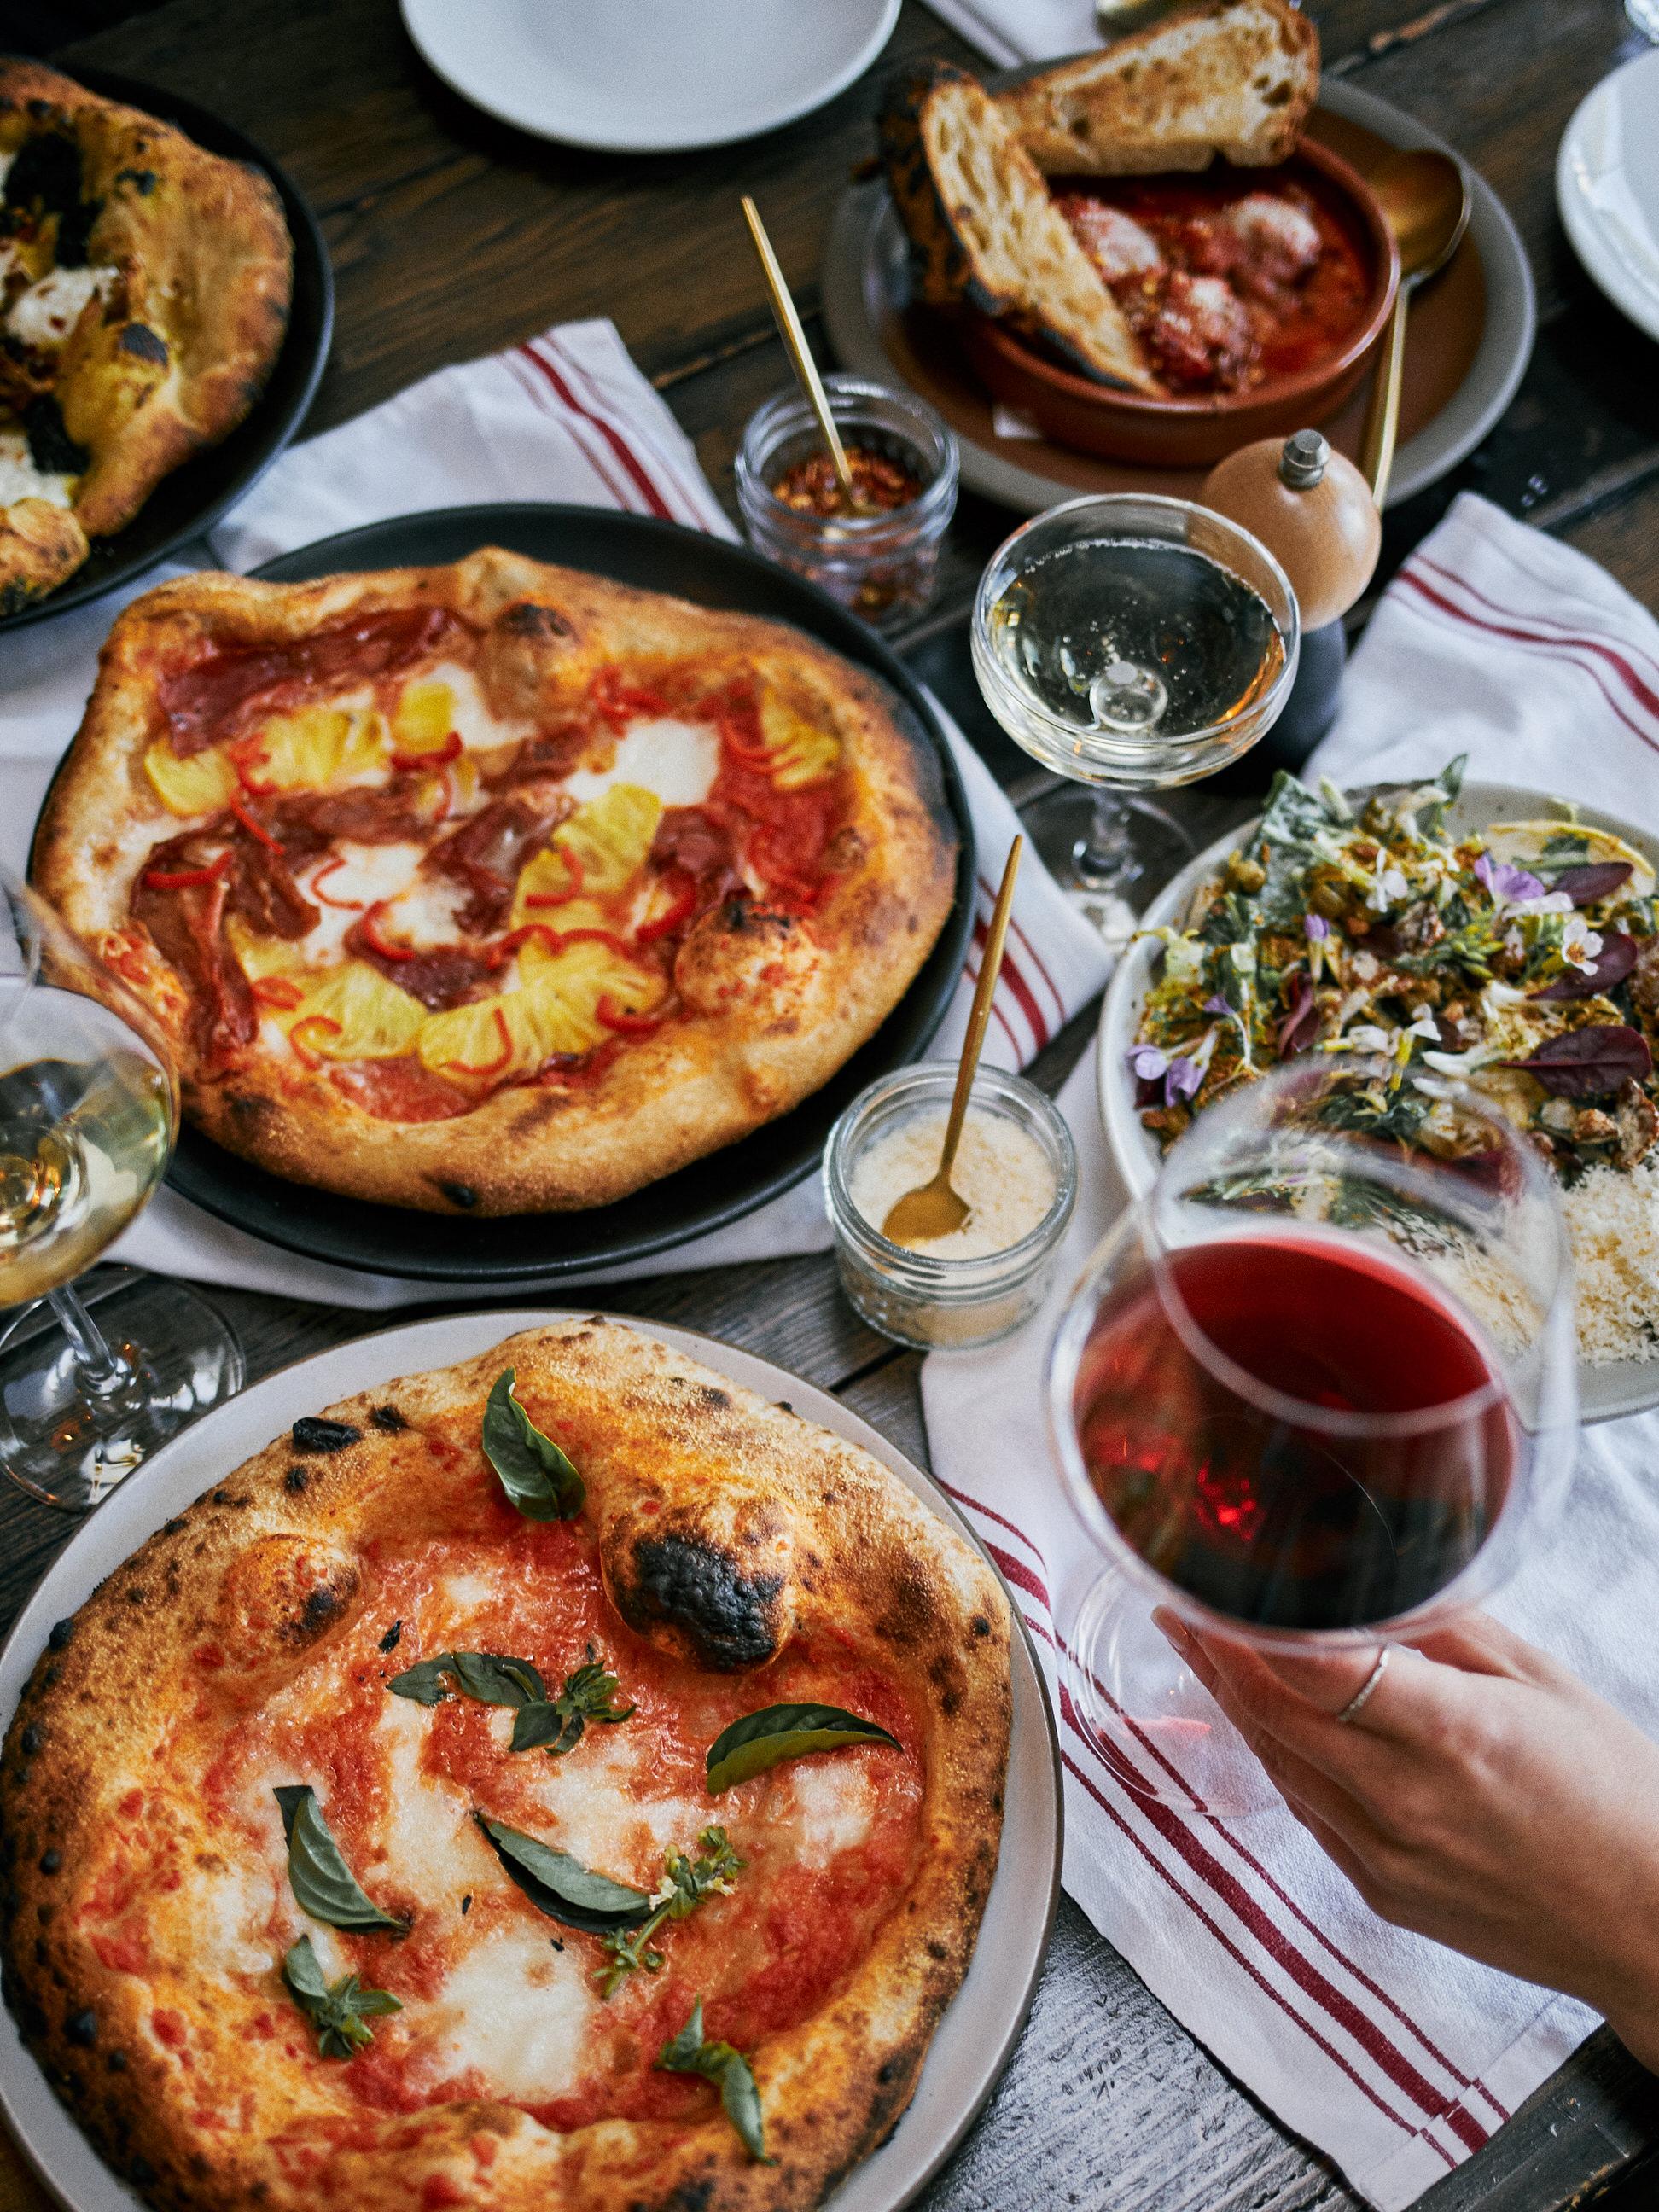 Hawaiian Pineapple Pizza and Red Wine